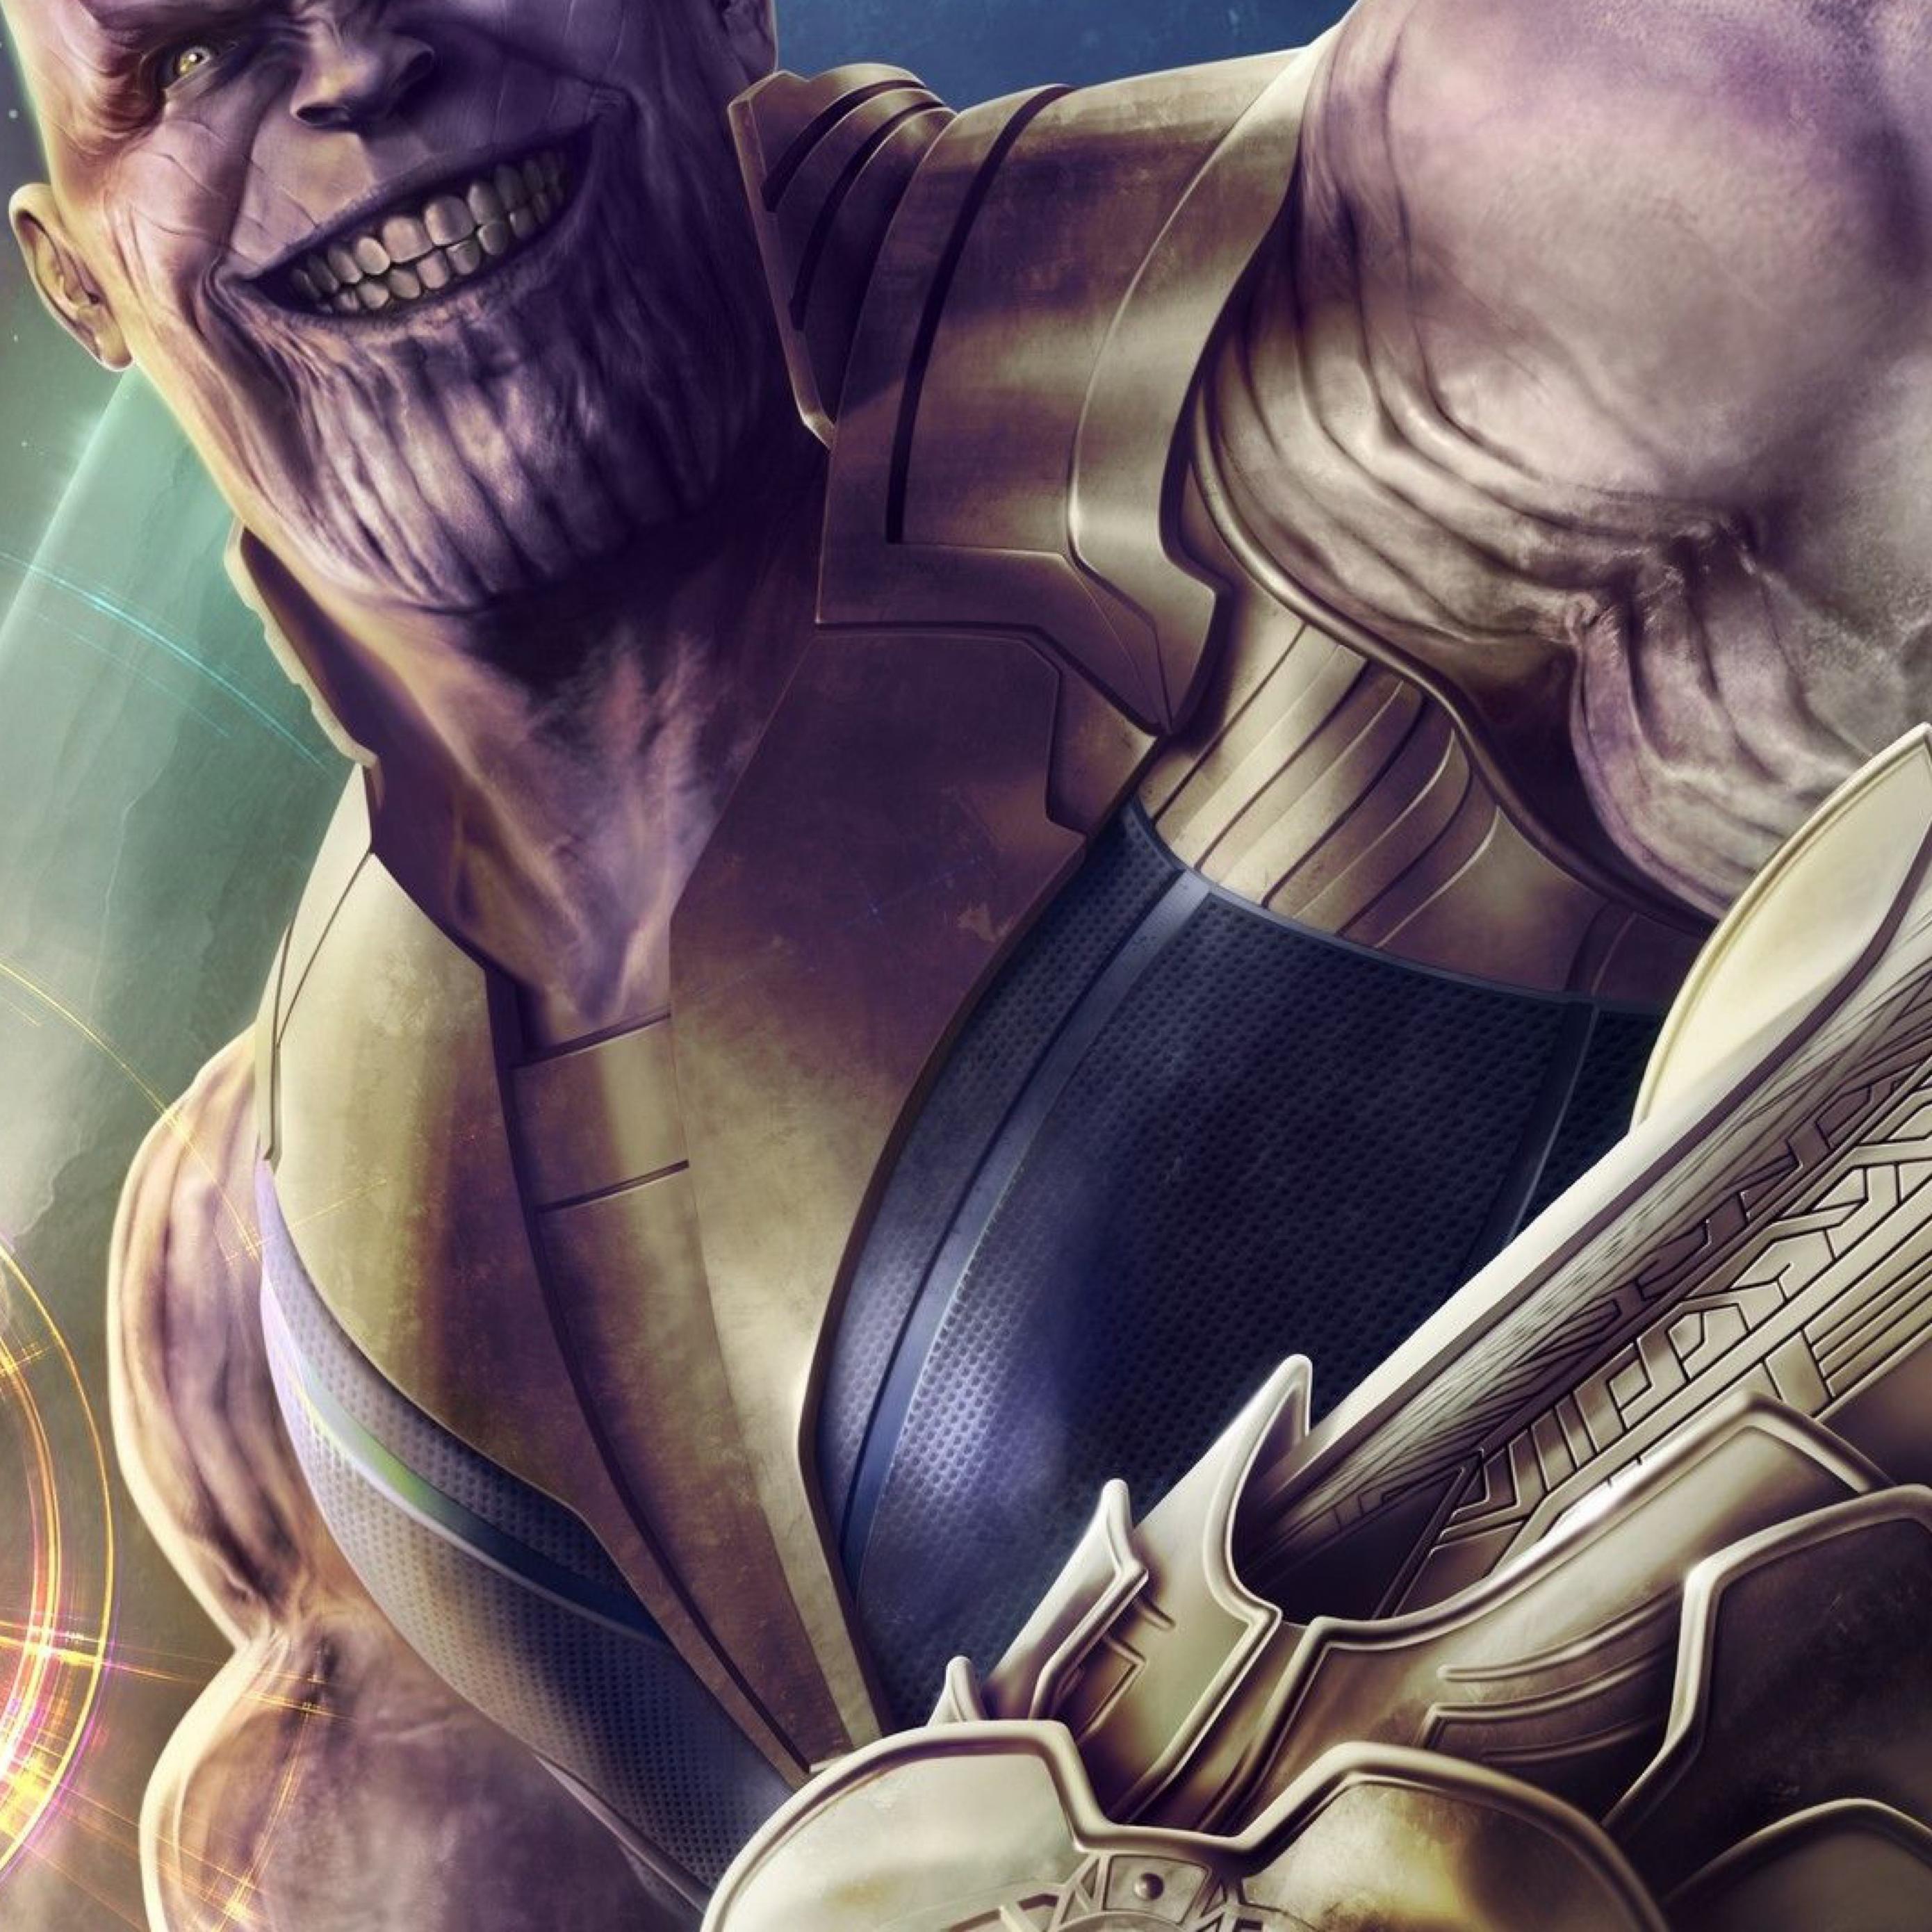 Download Thanos Infinity Stone Artwork Apple iPad Air wallpaper 2780x2780